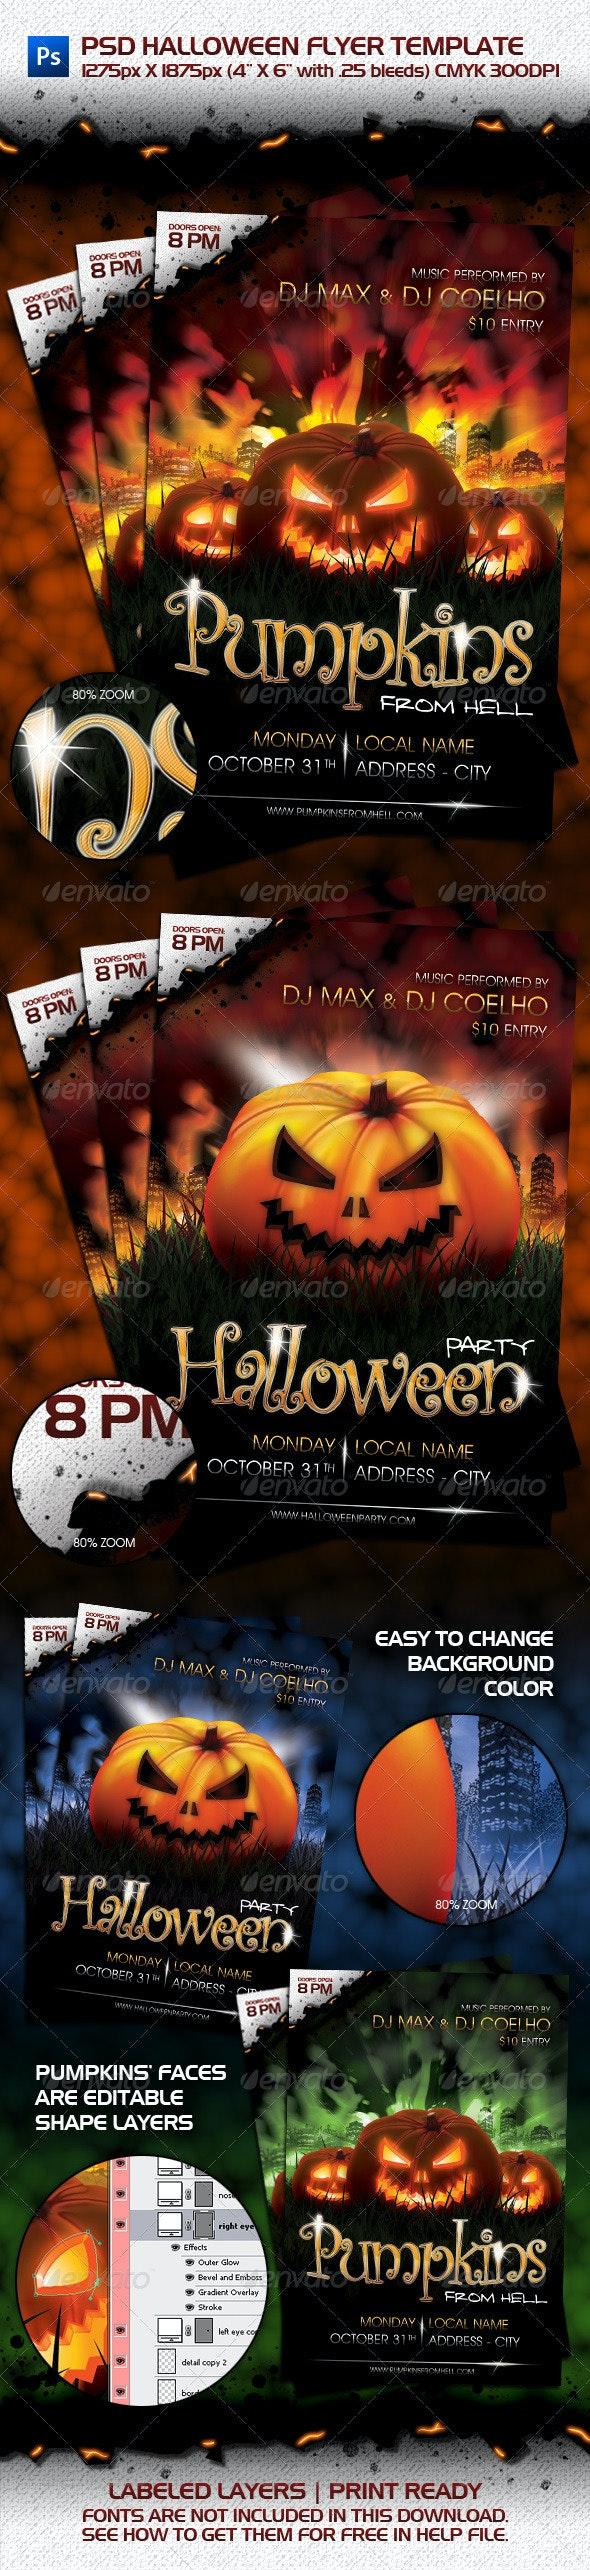 PSD Halloween Flyer Template - Clubs & Parties Events